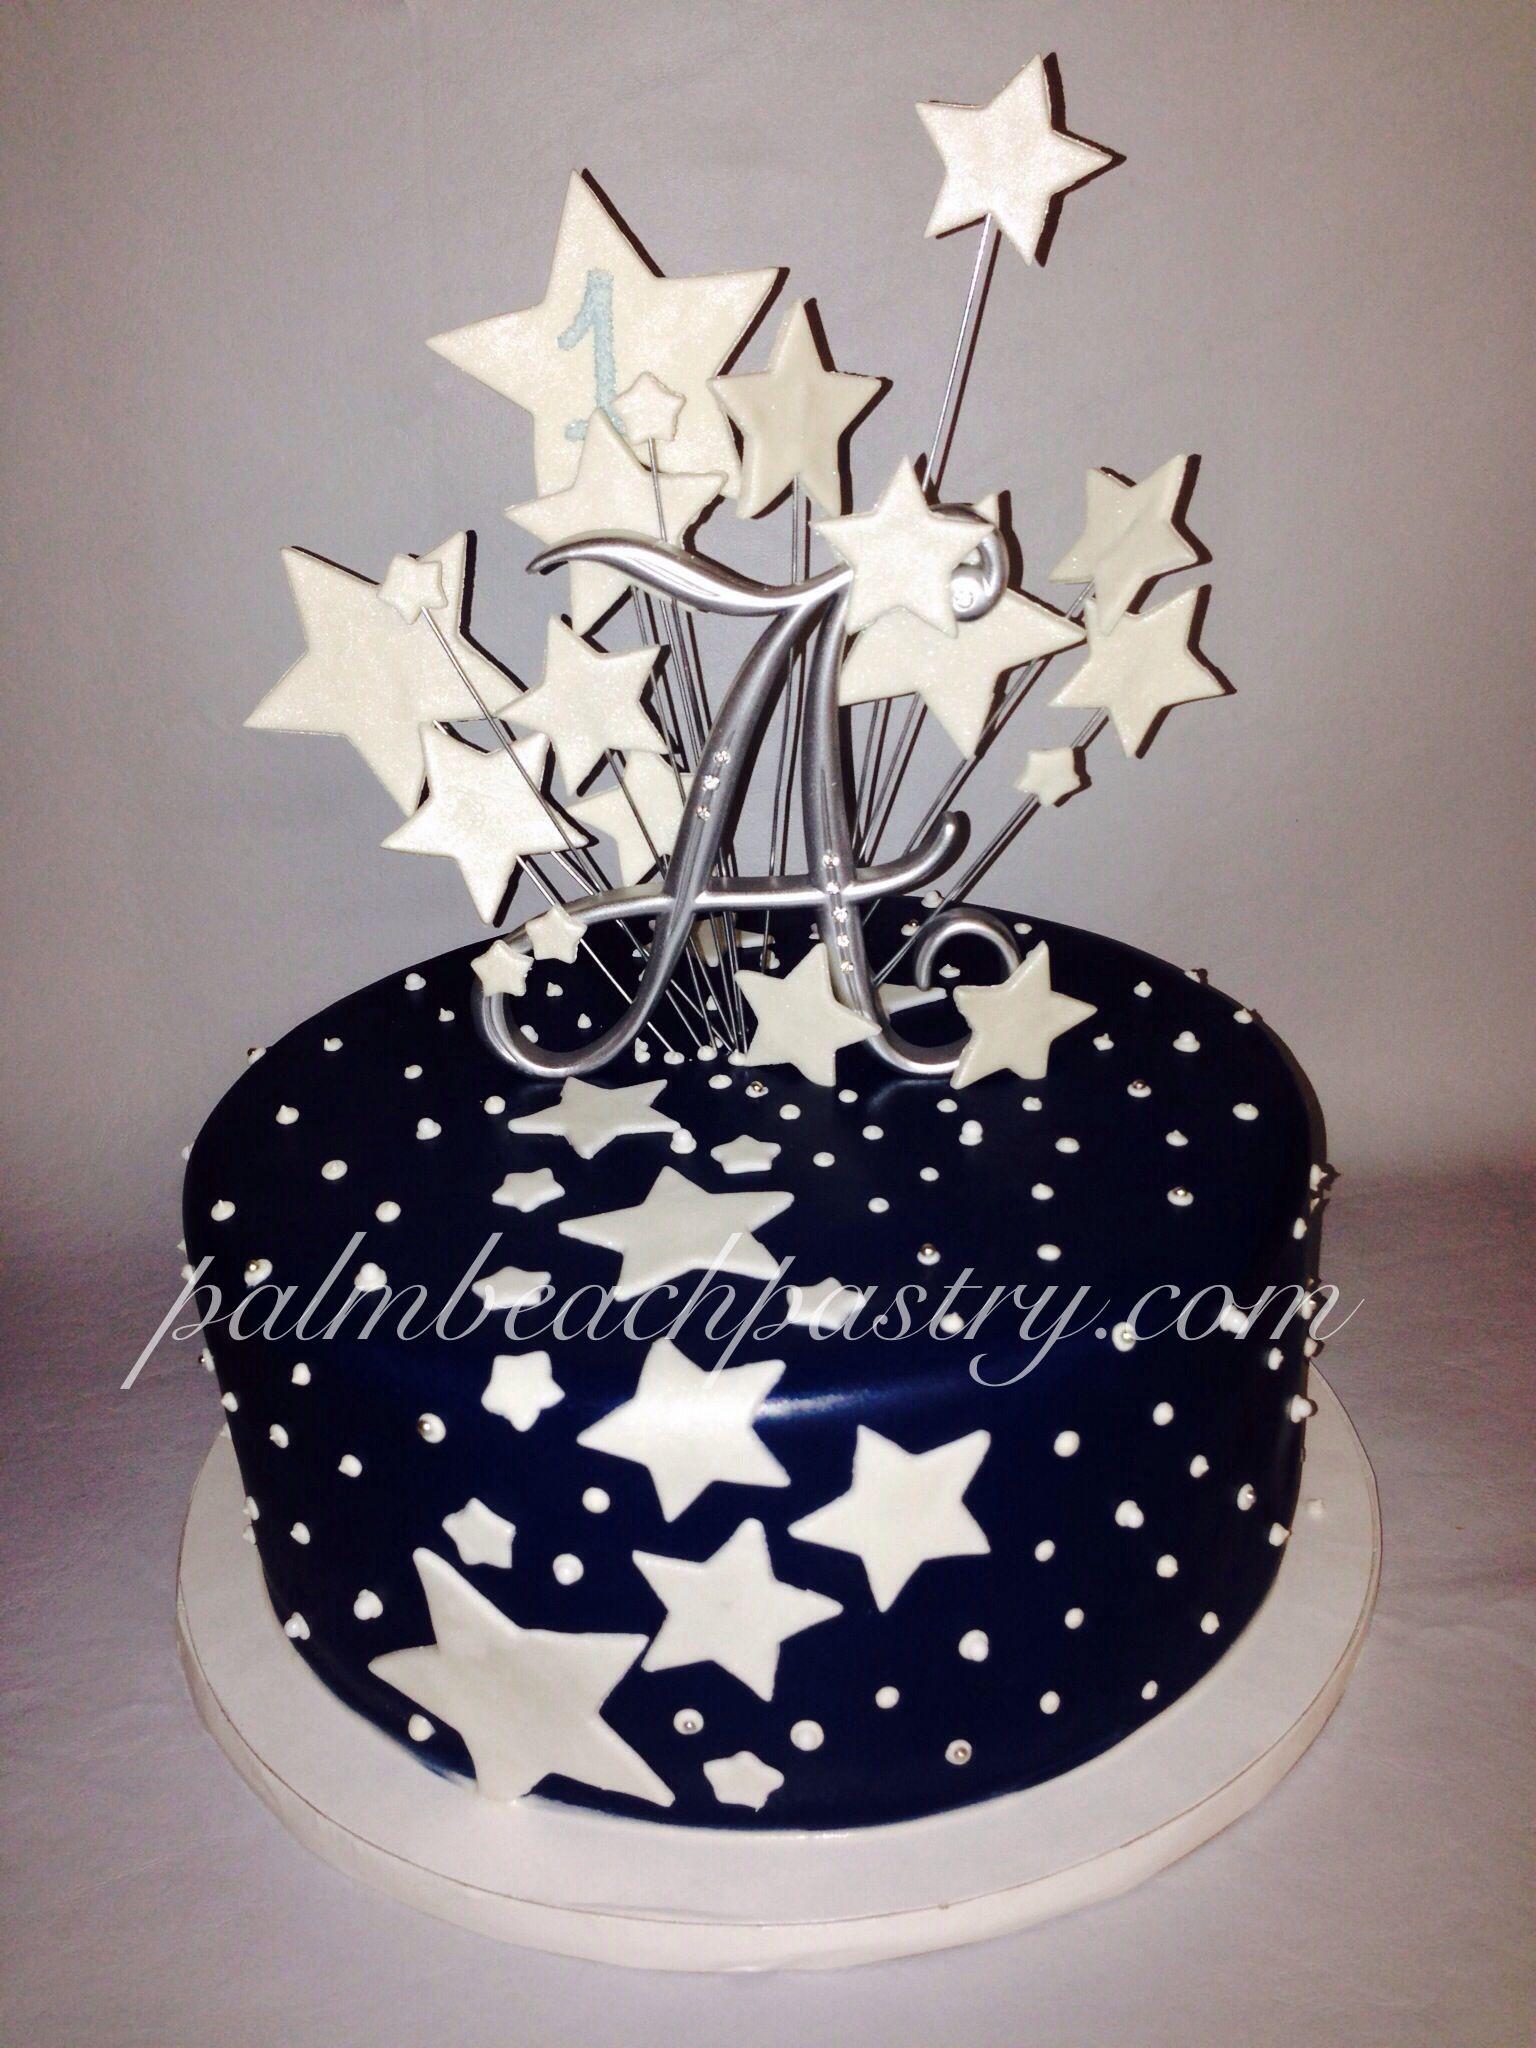 Starburst Galaxy Star Cake With Midnight Blue Fondant